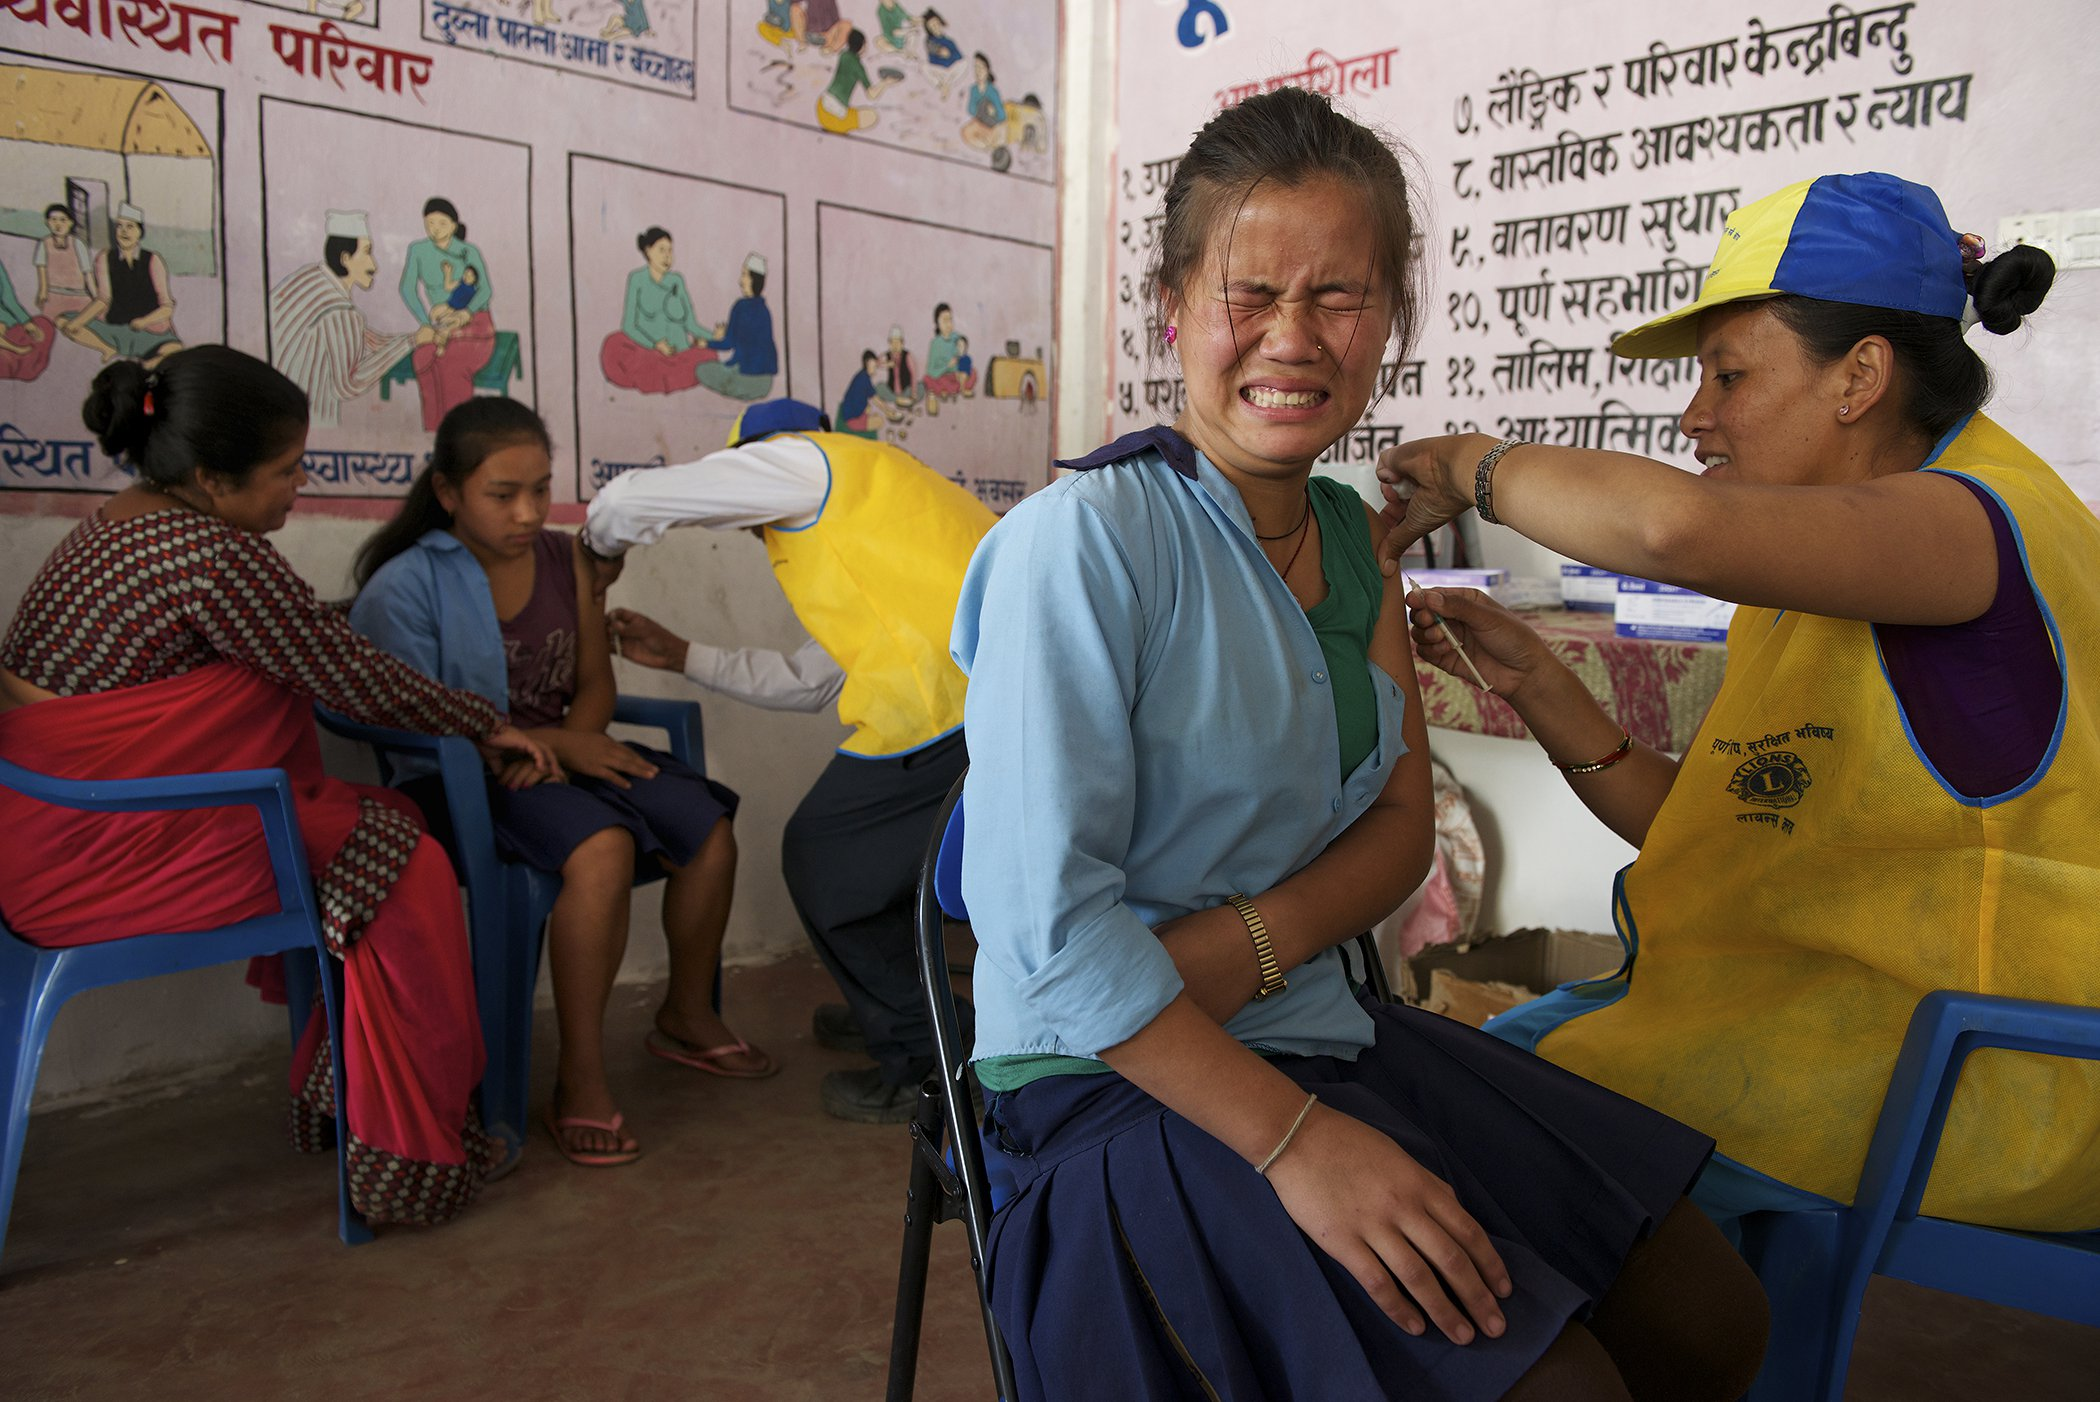 UNICEF_Vaccinations-Around-The-World_003.JPG